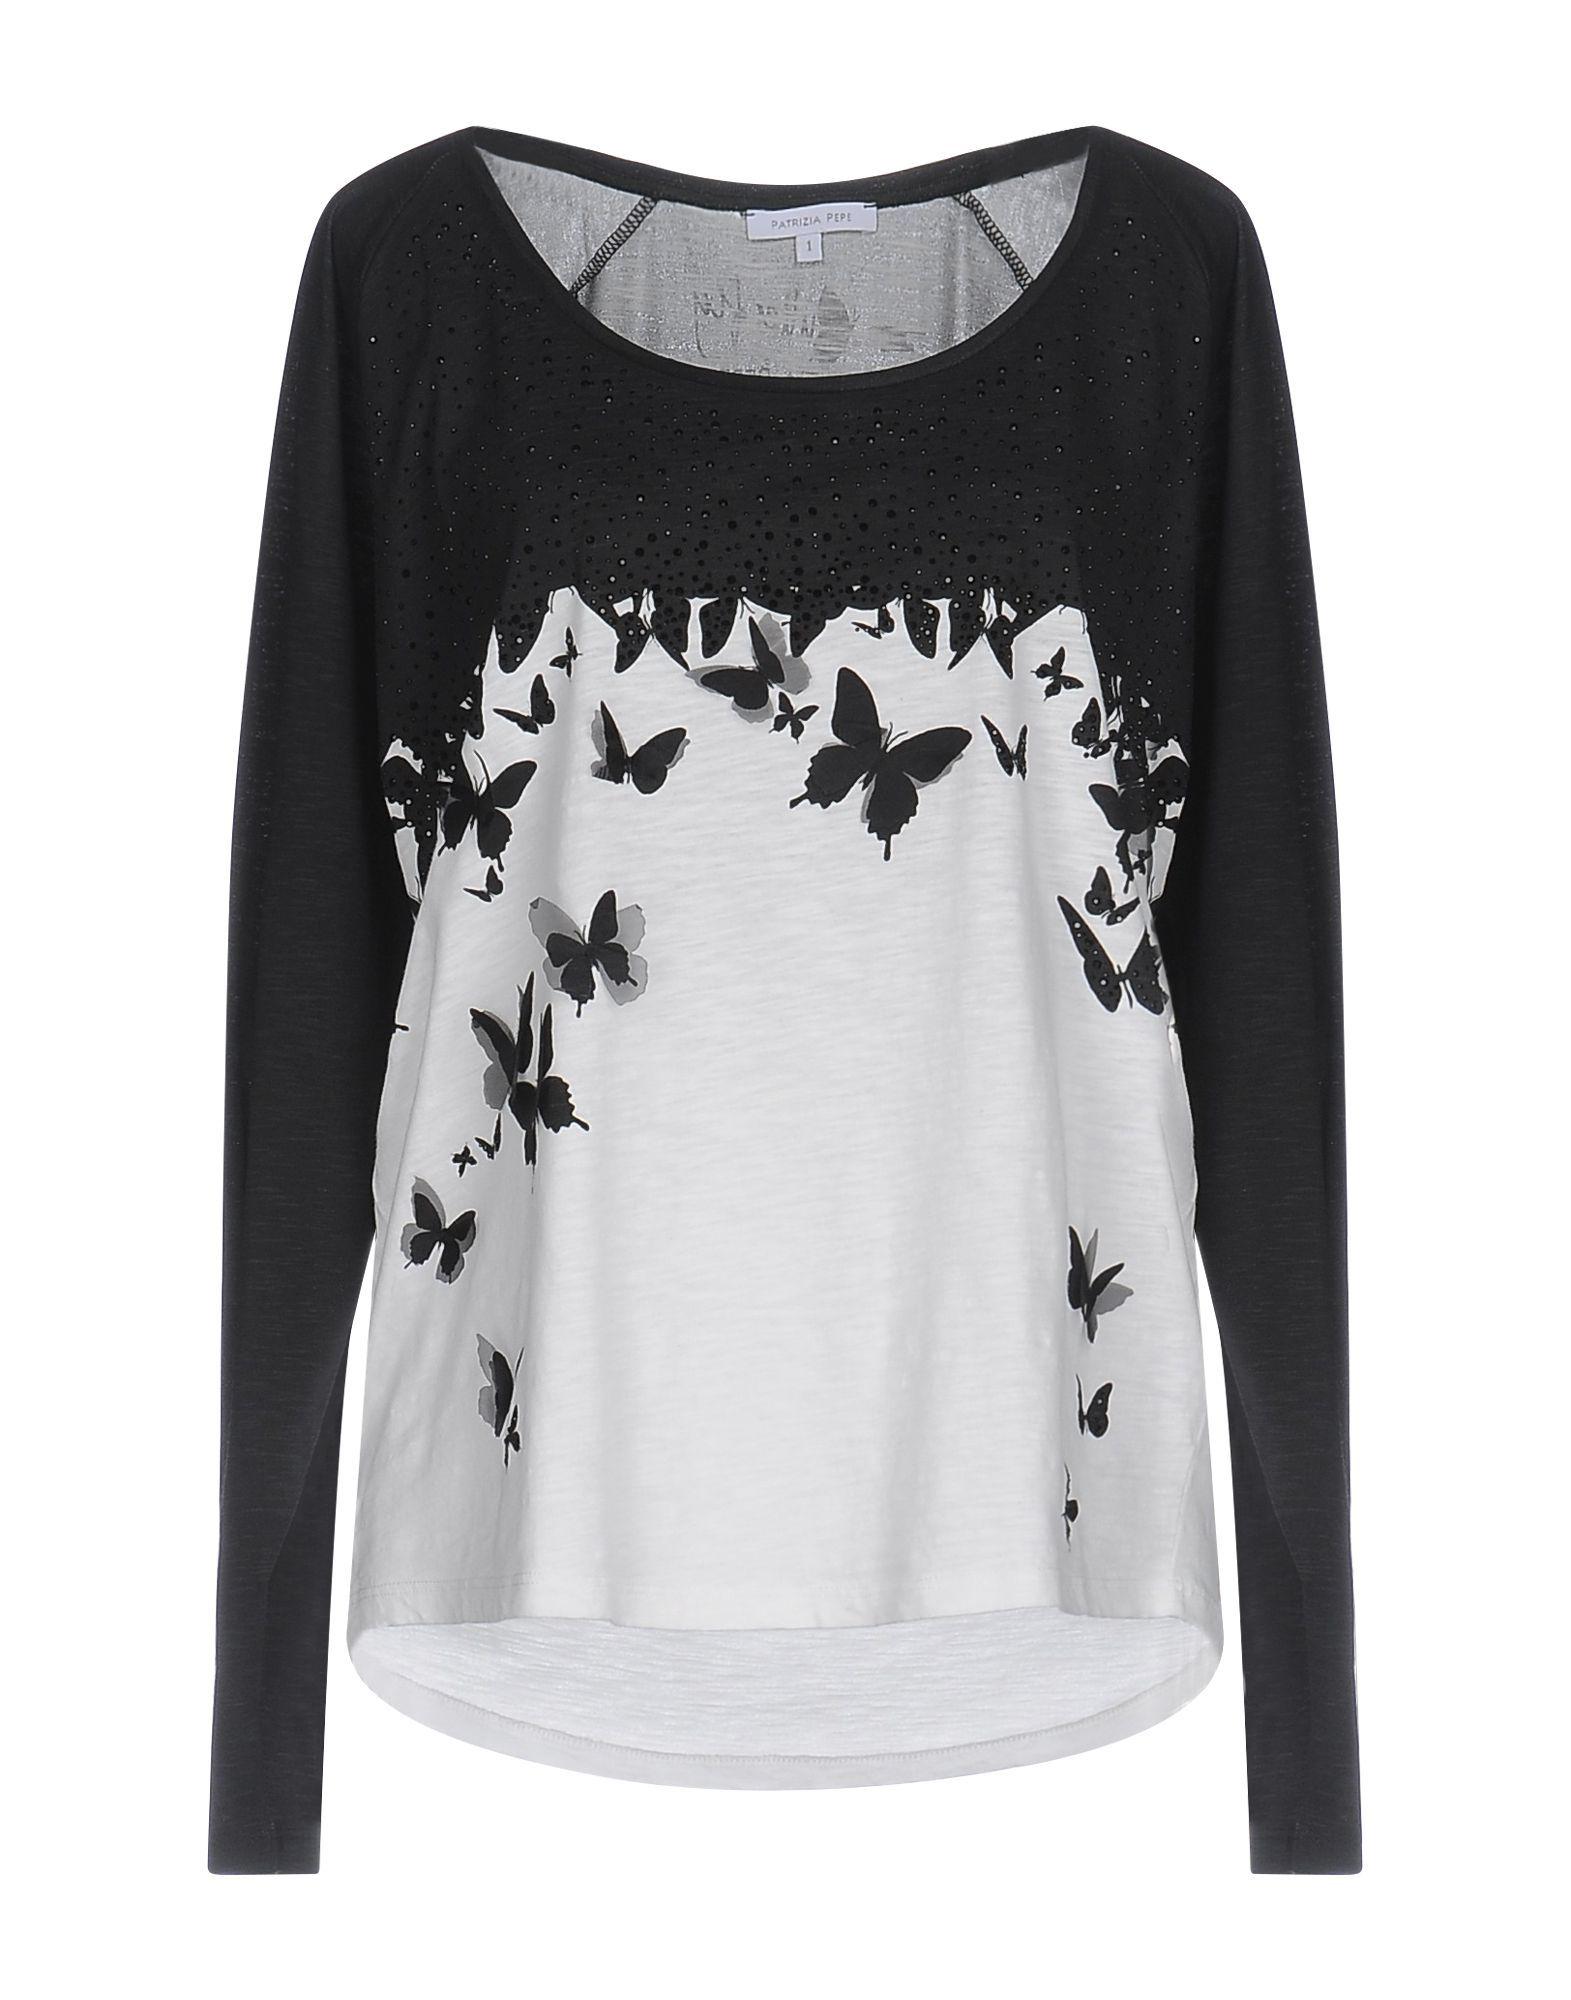 Patrizia Pepe Black Cotton Long Sleeve T-Shirt